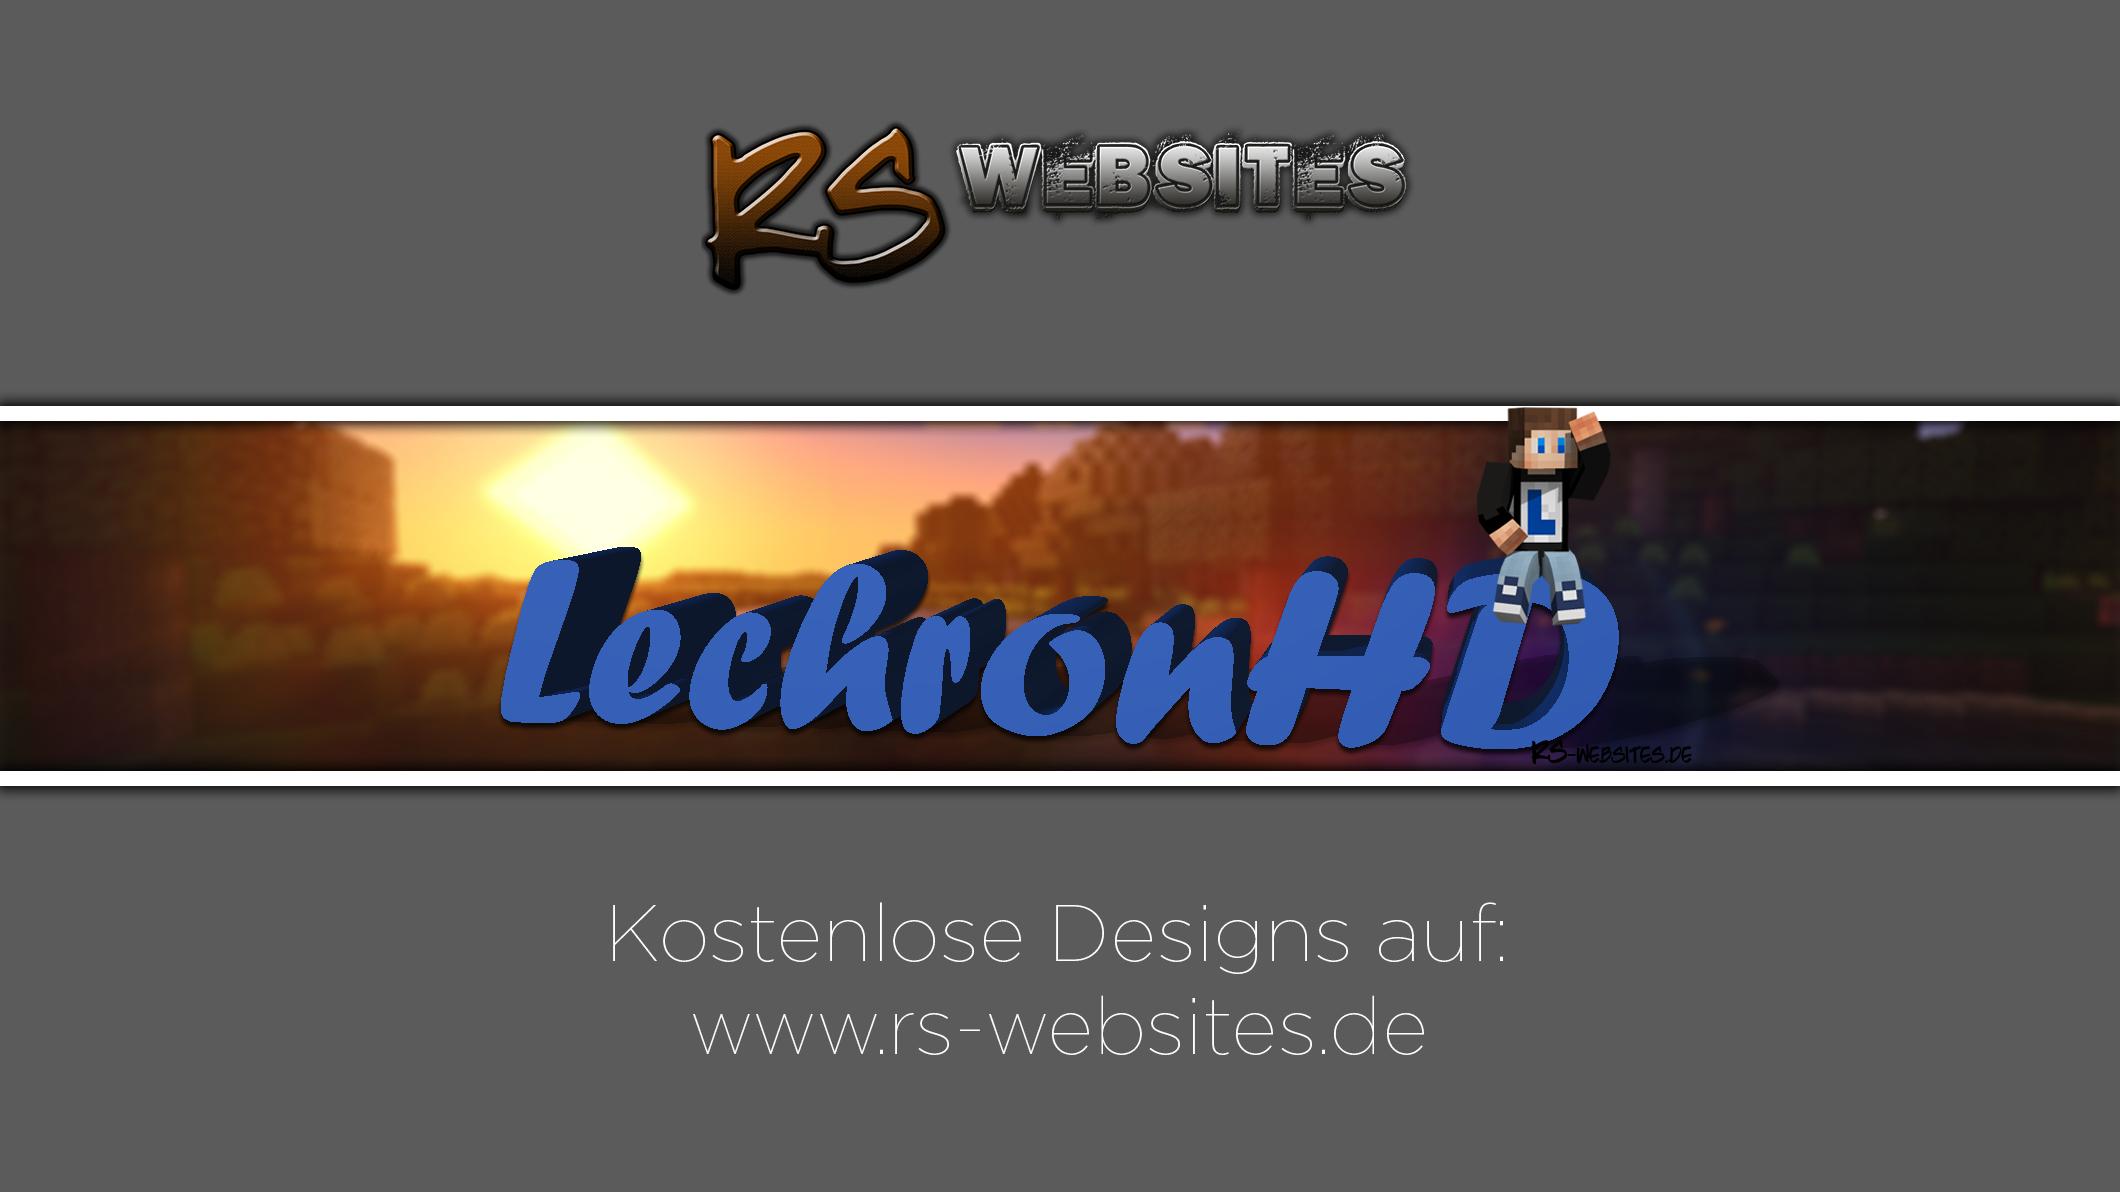 LechronHD YouTube Banner